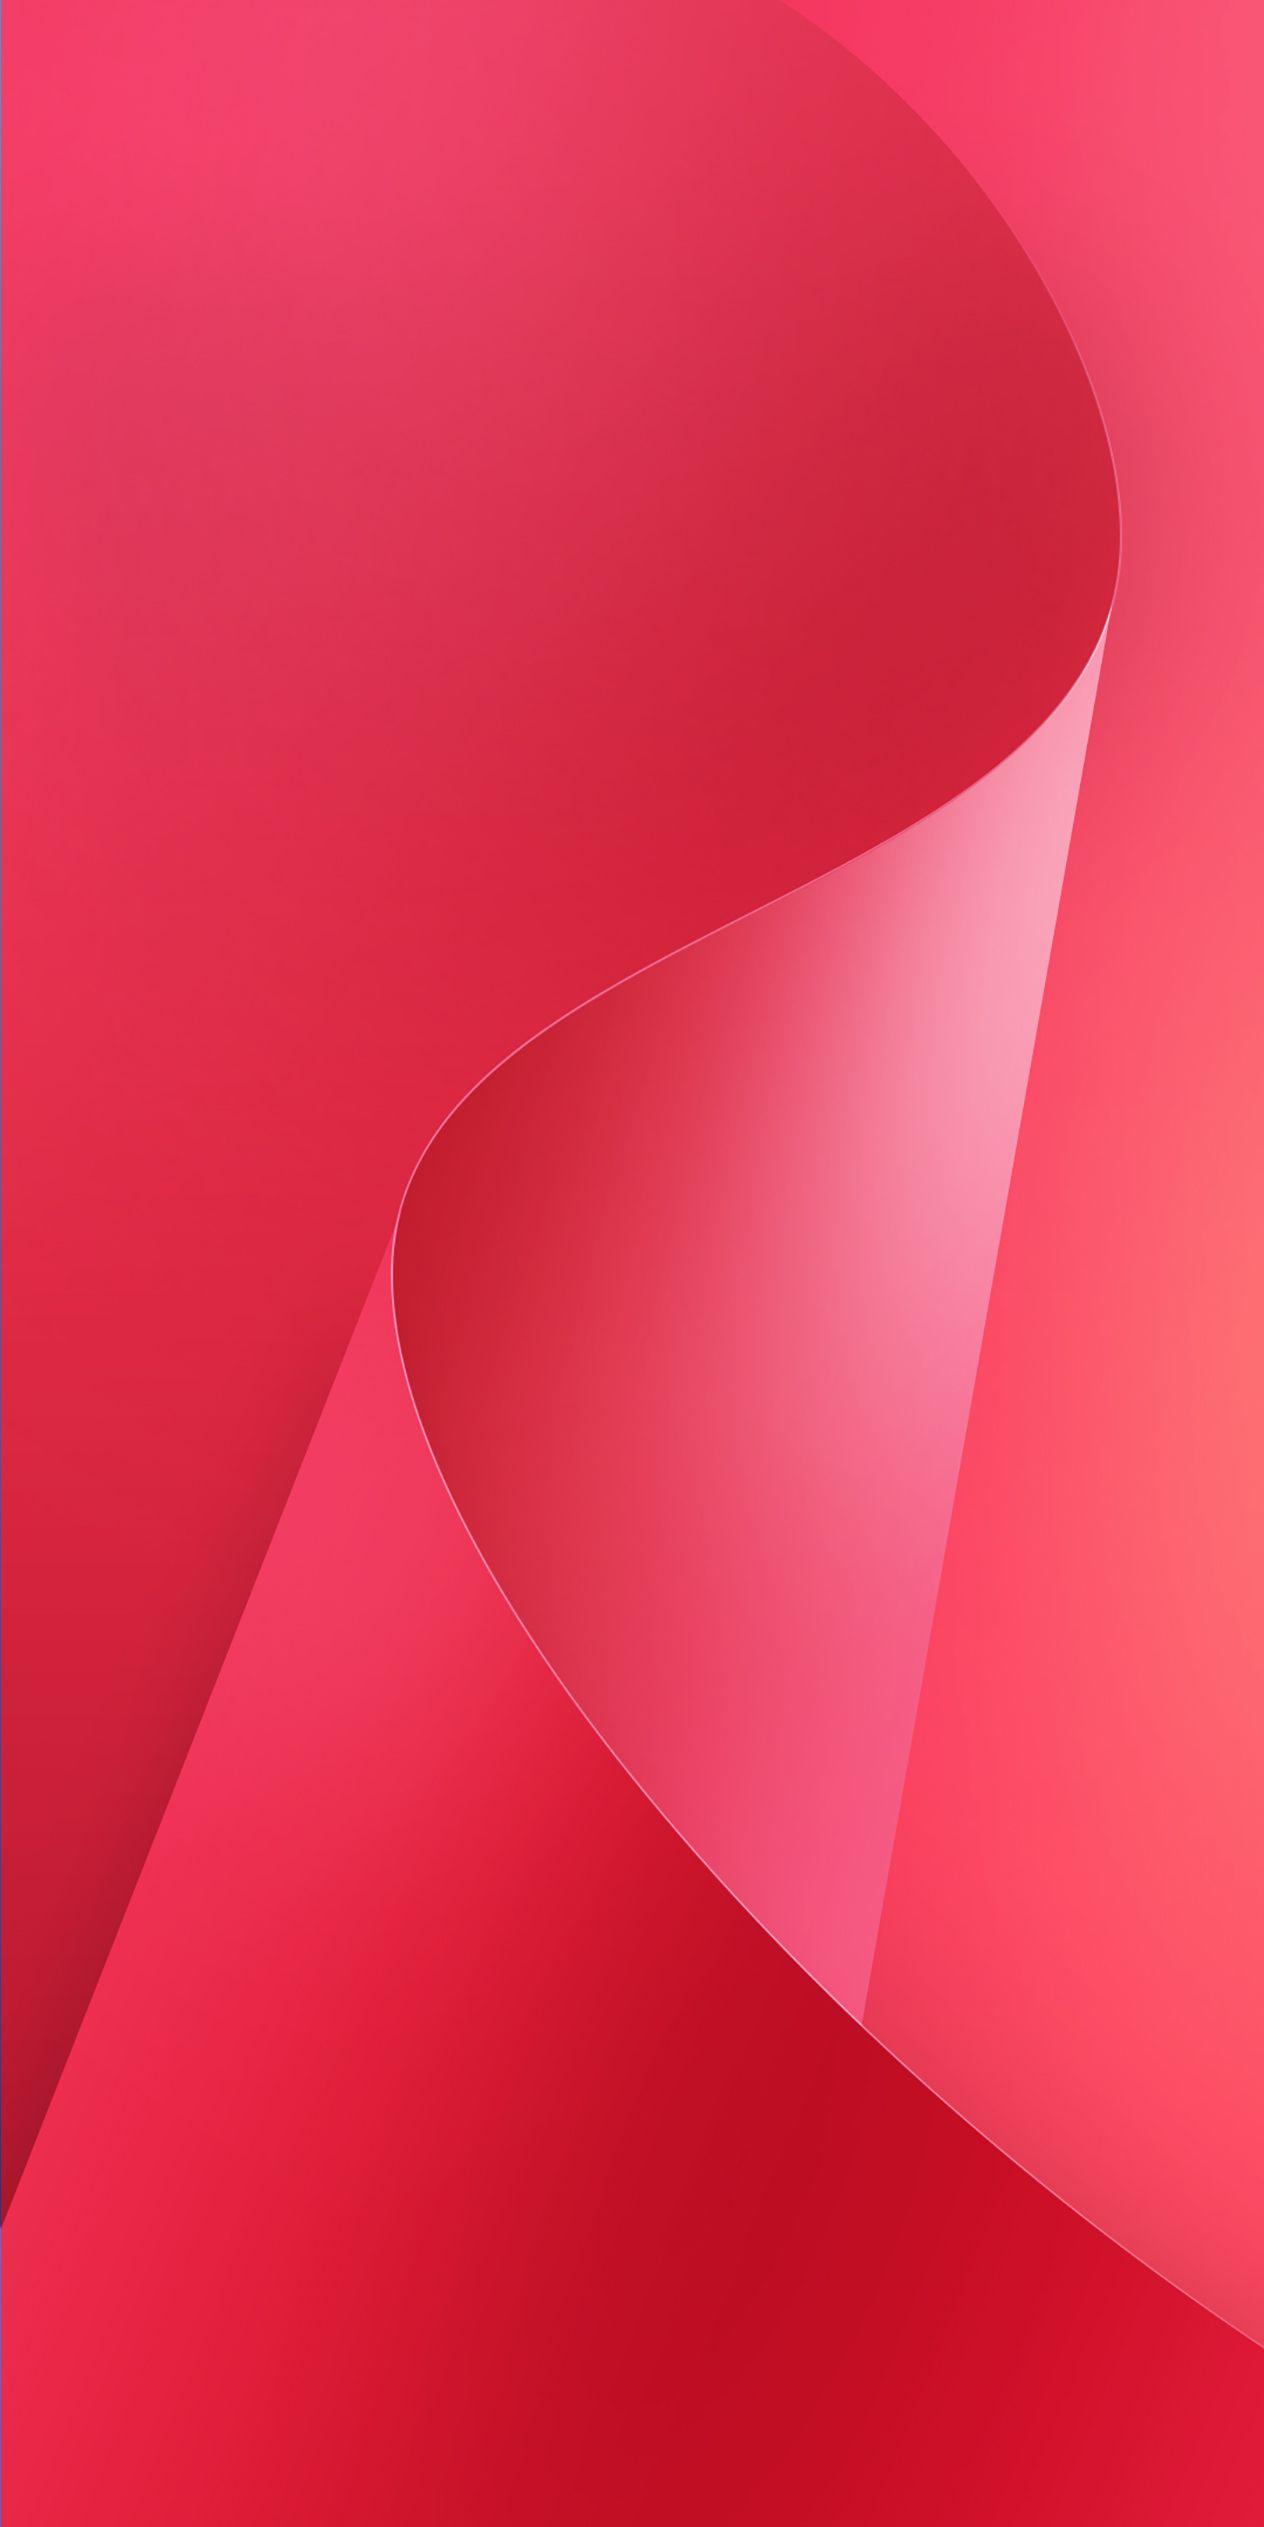 Pin By 小馨 羅 On 背景 Pink Wallpaper Iphone Apple Wallpaper